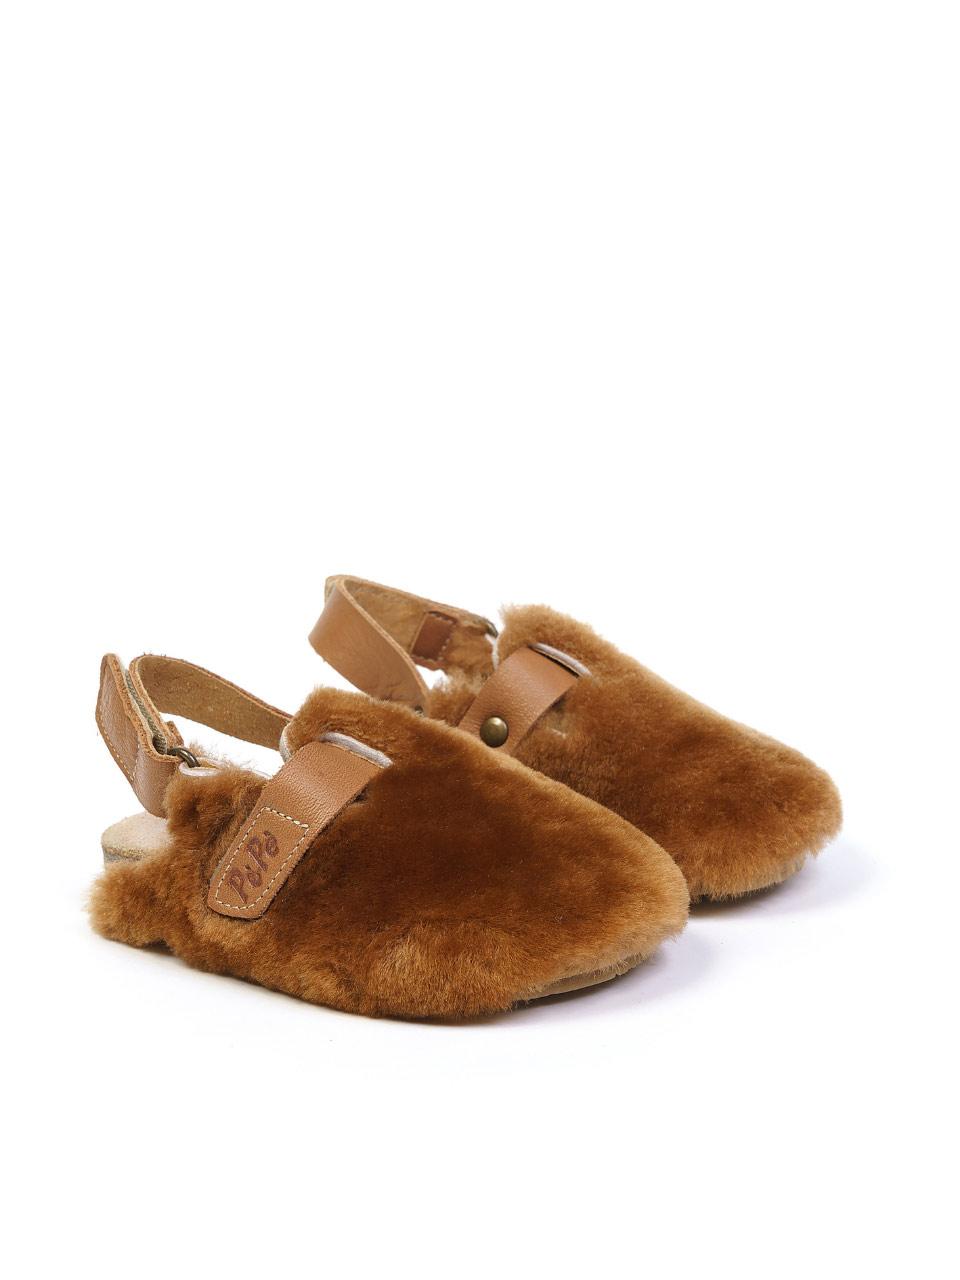 sabot Pepe Shoes Children